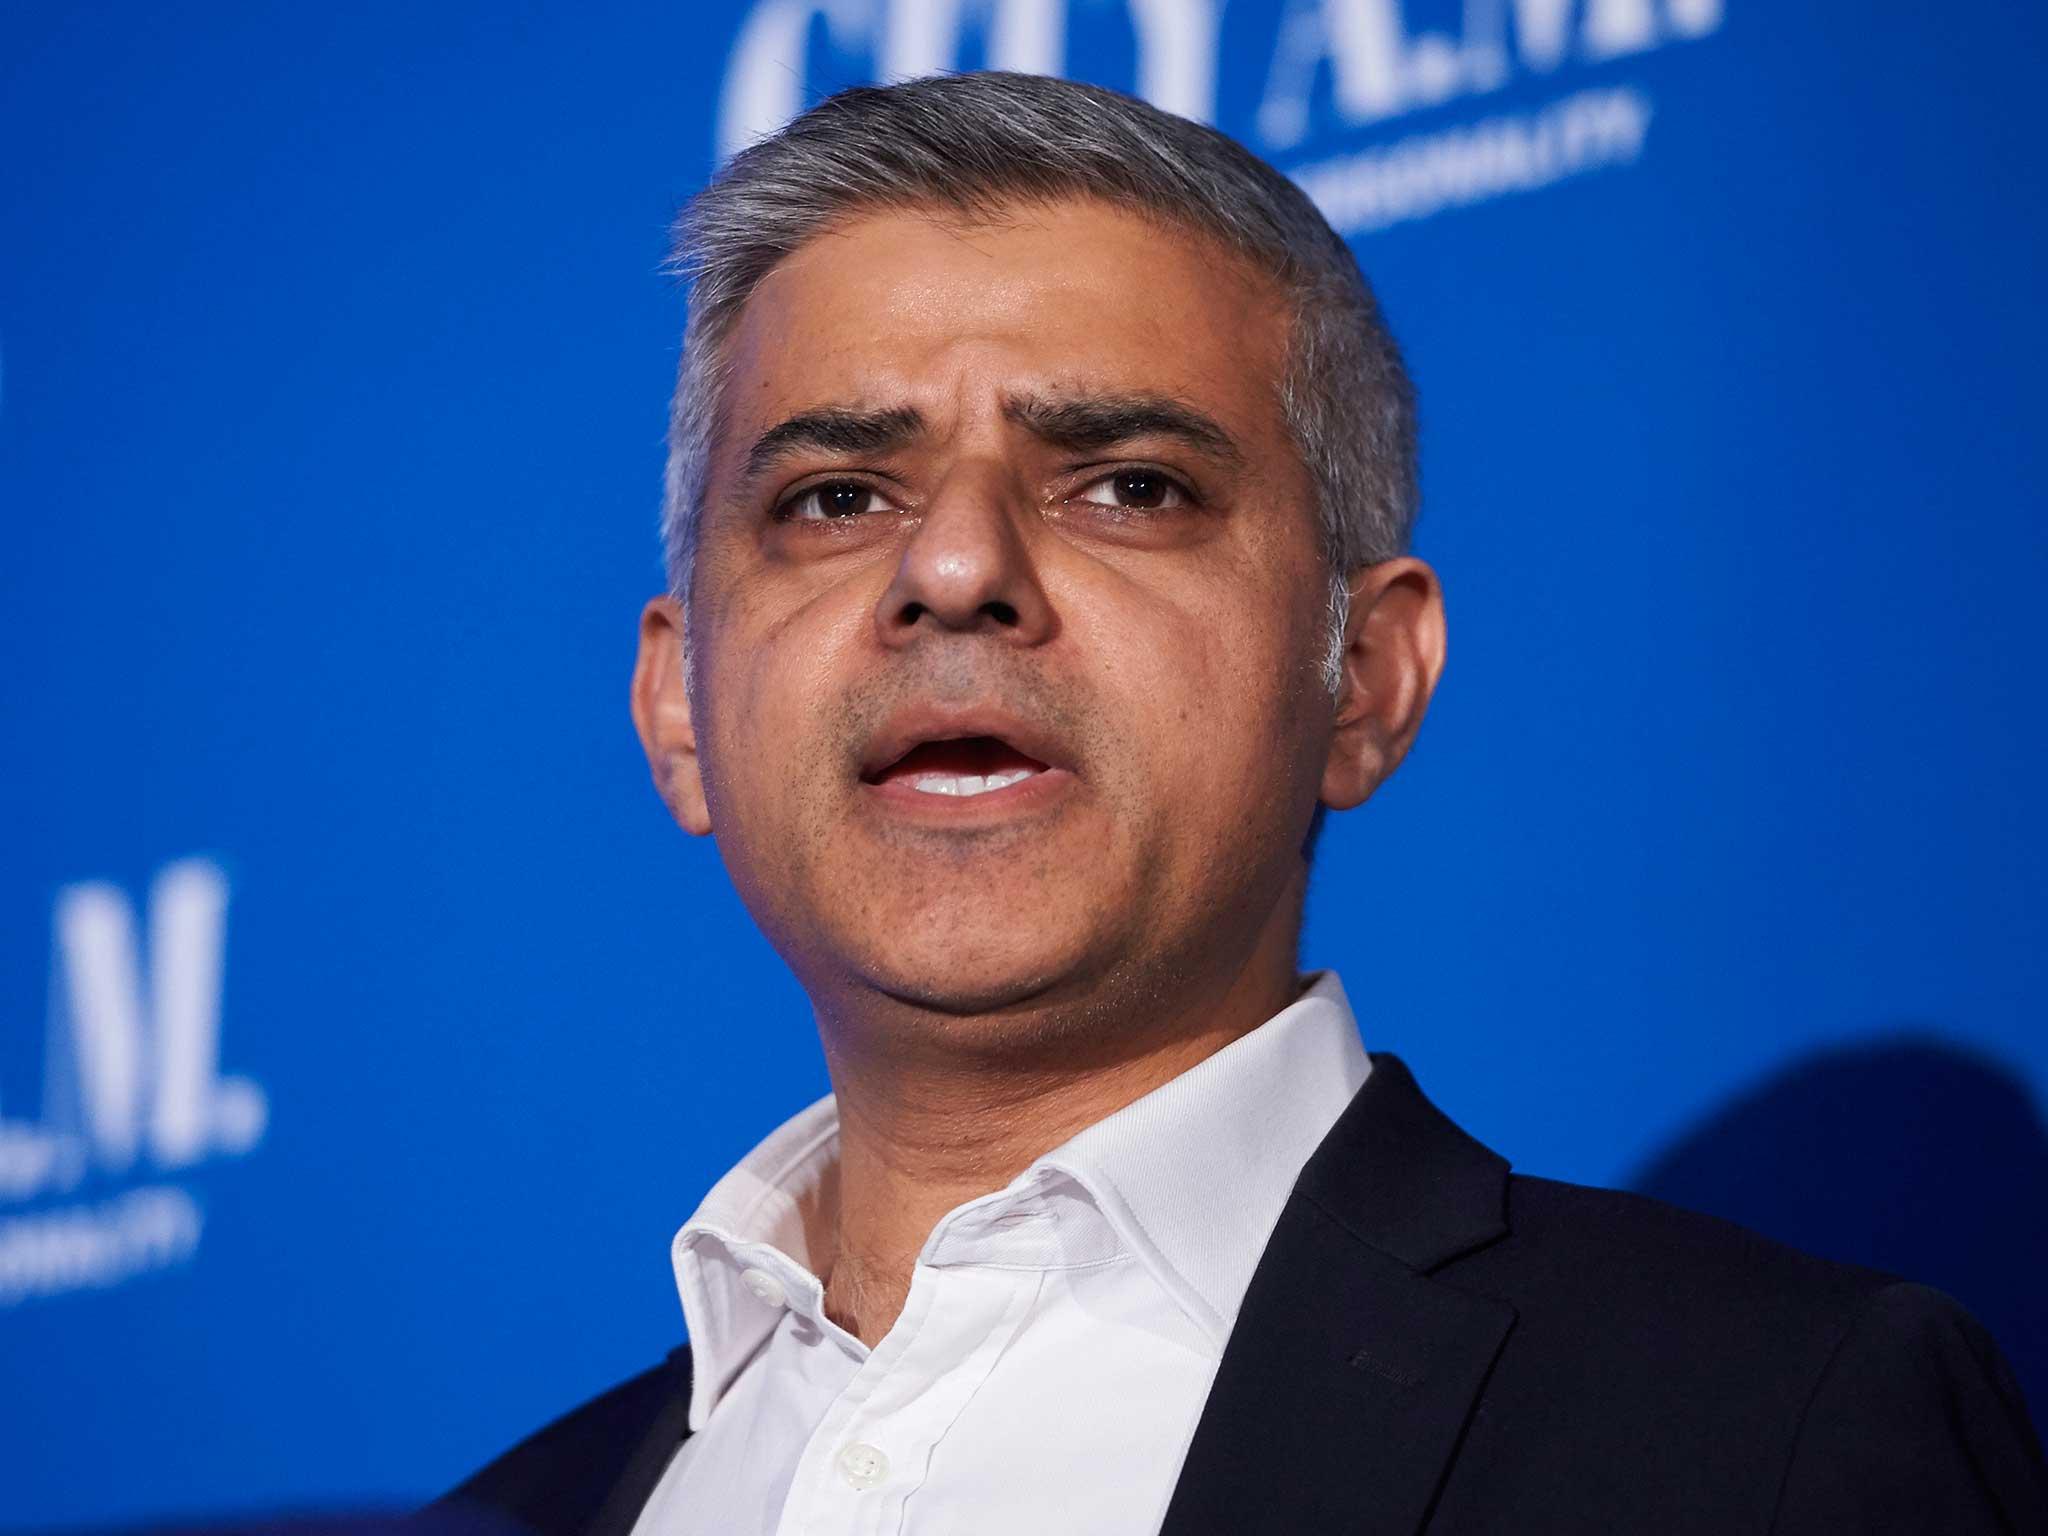 London Mayor: 'Cruel' Trump Should Be Denied State Visit